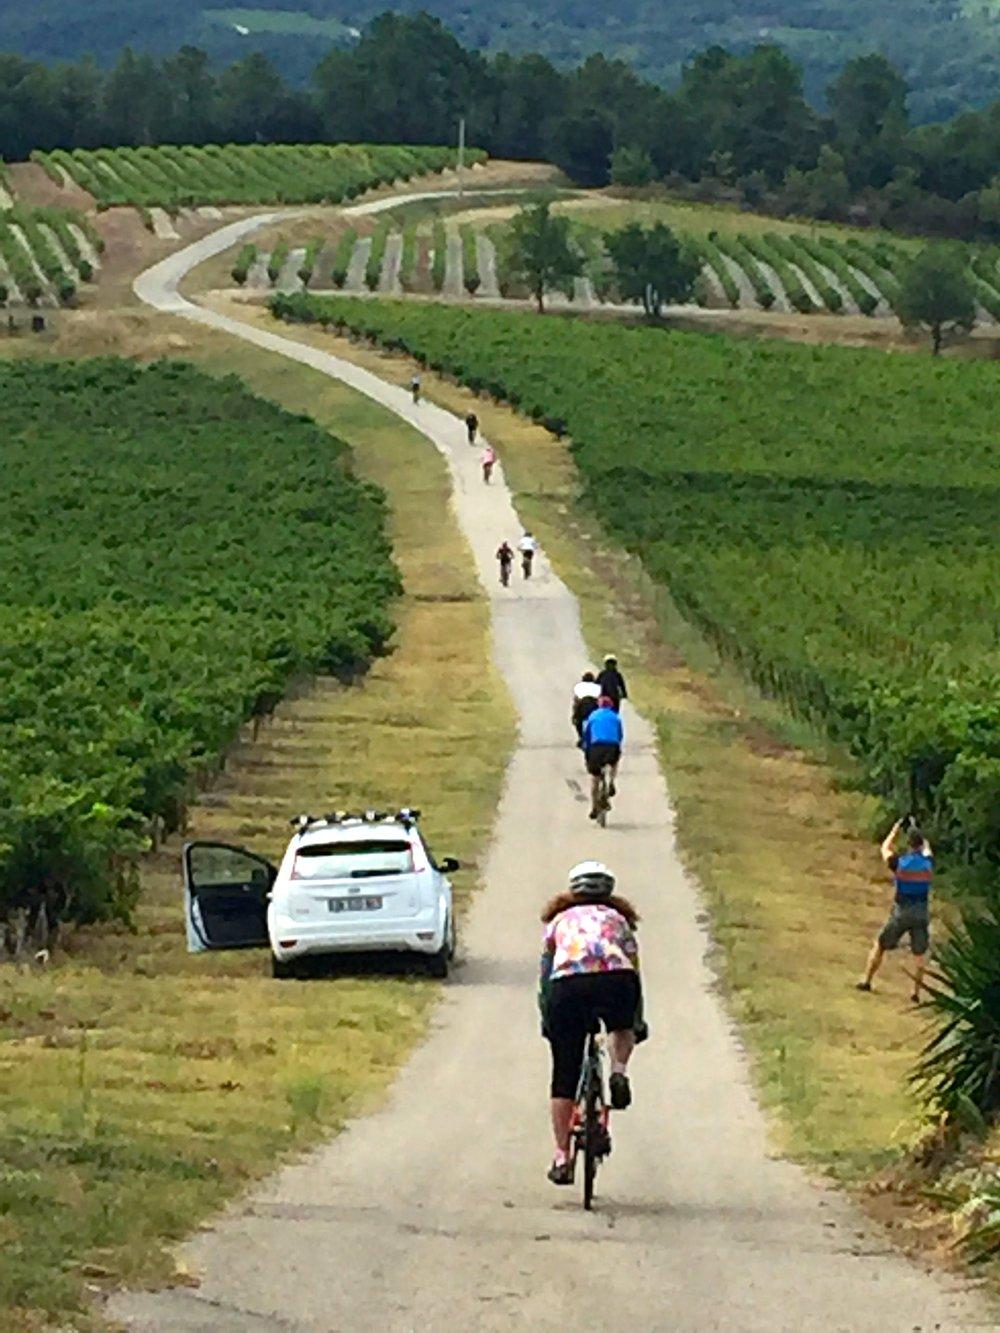 Pedaling a quiet Provençal lane